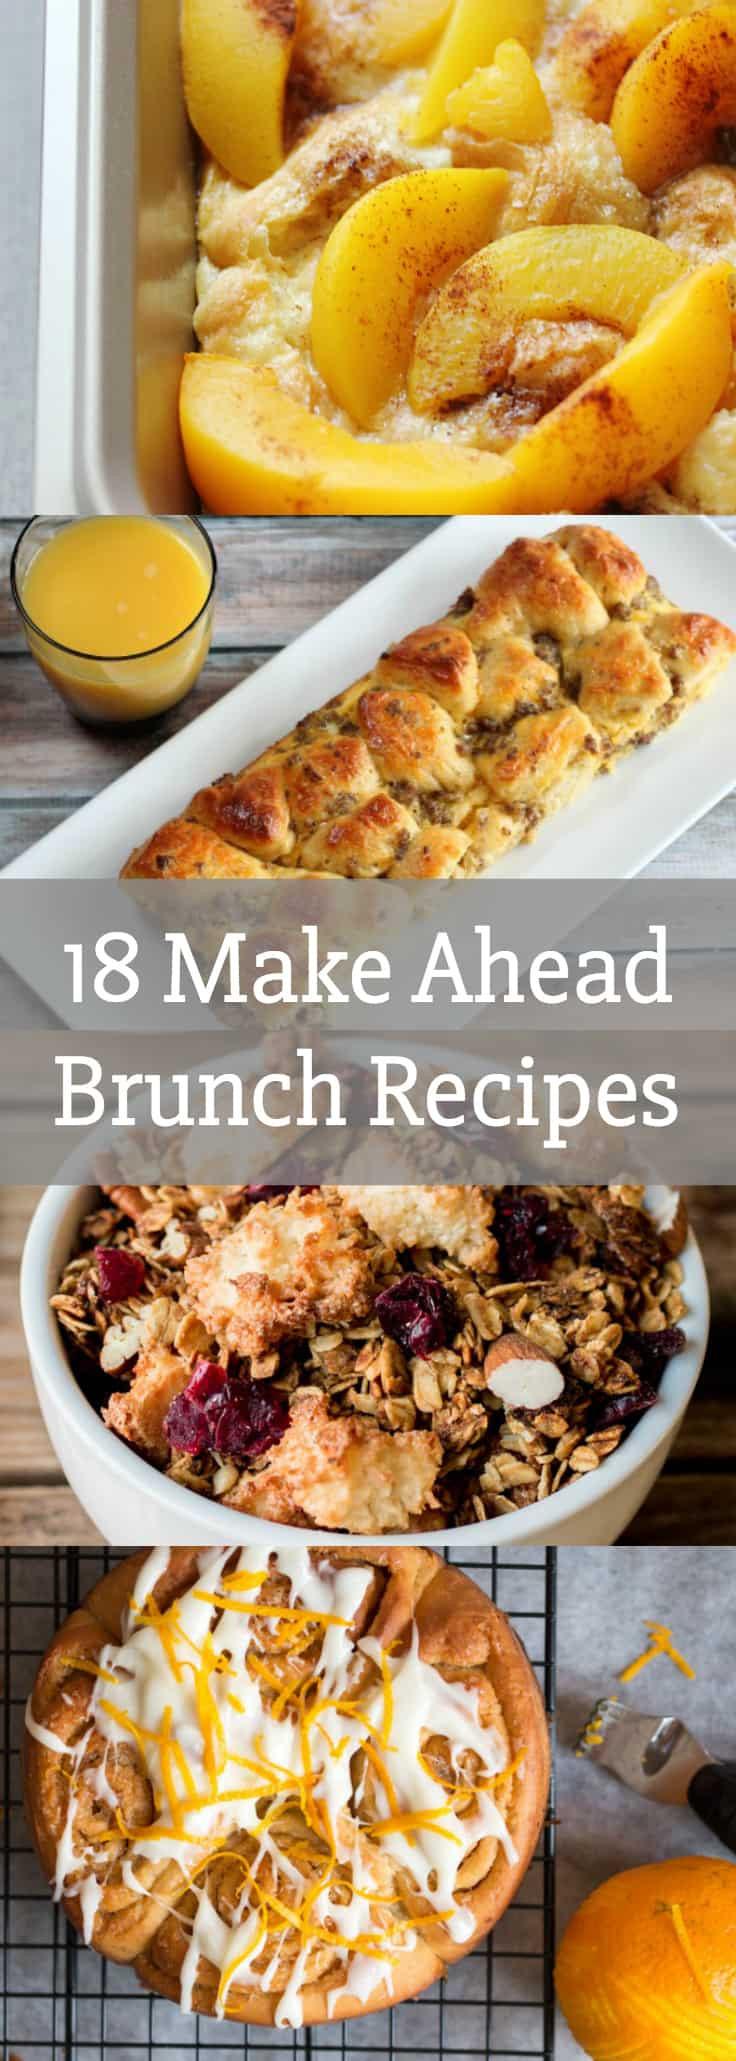 Breakfast Food Recipes  18 Make Ahead Brunch Recipes breakfast food recipes